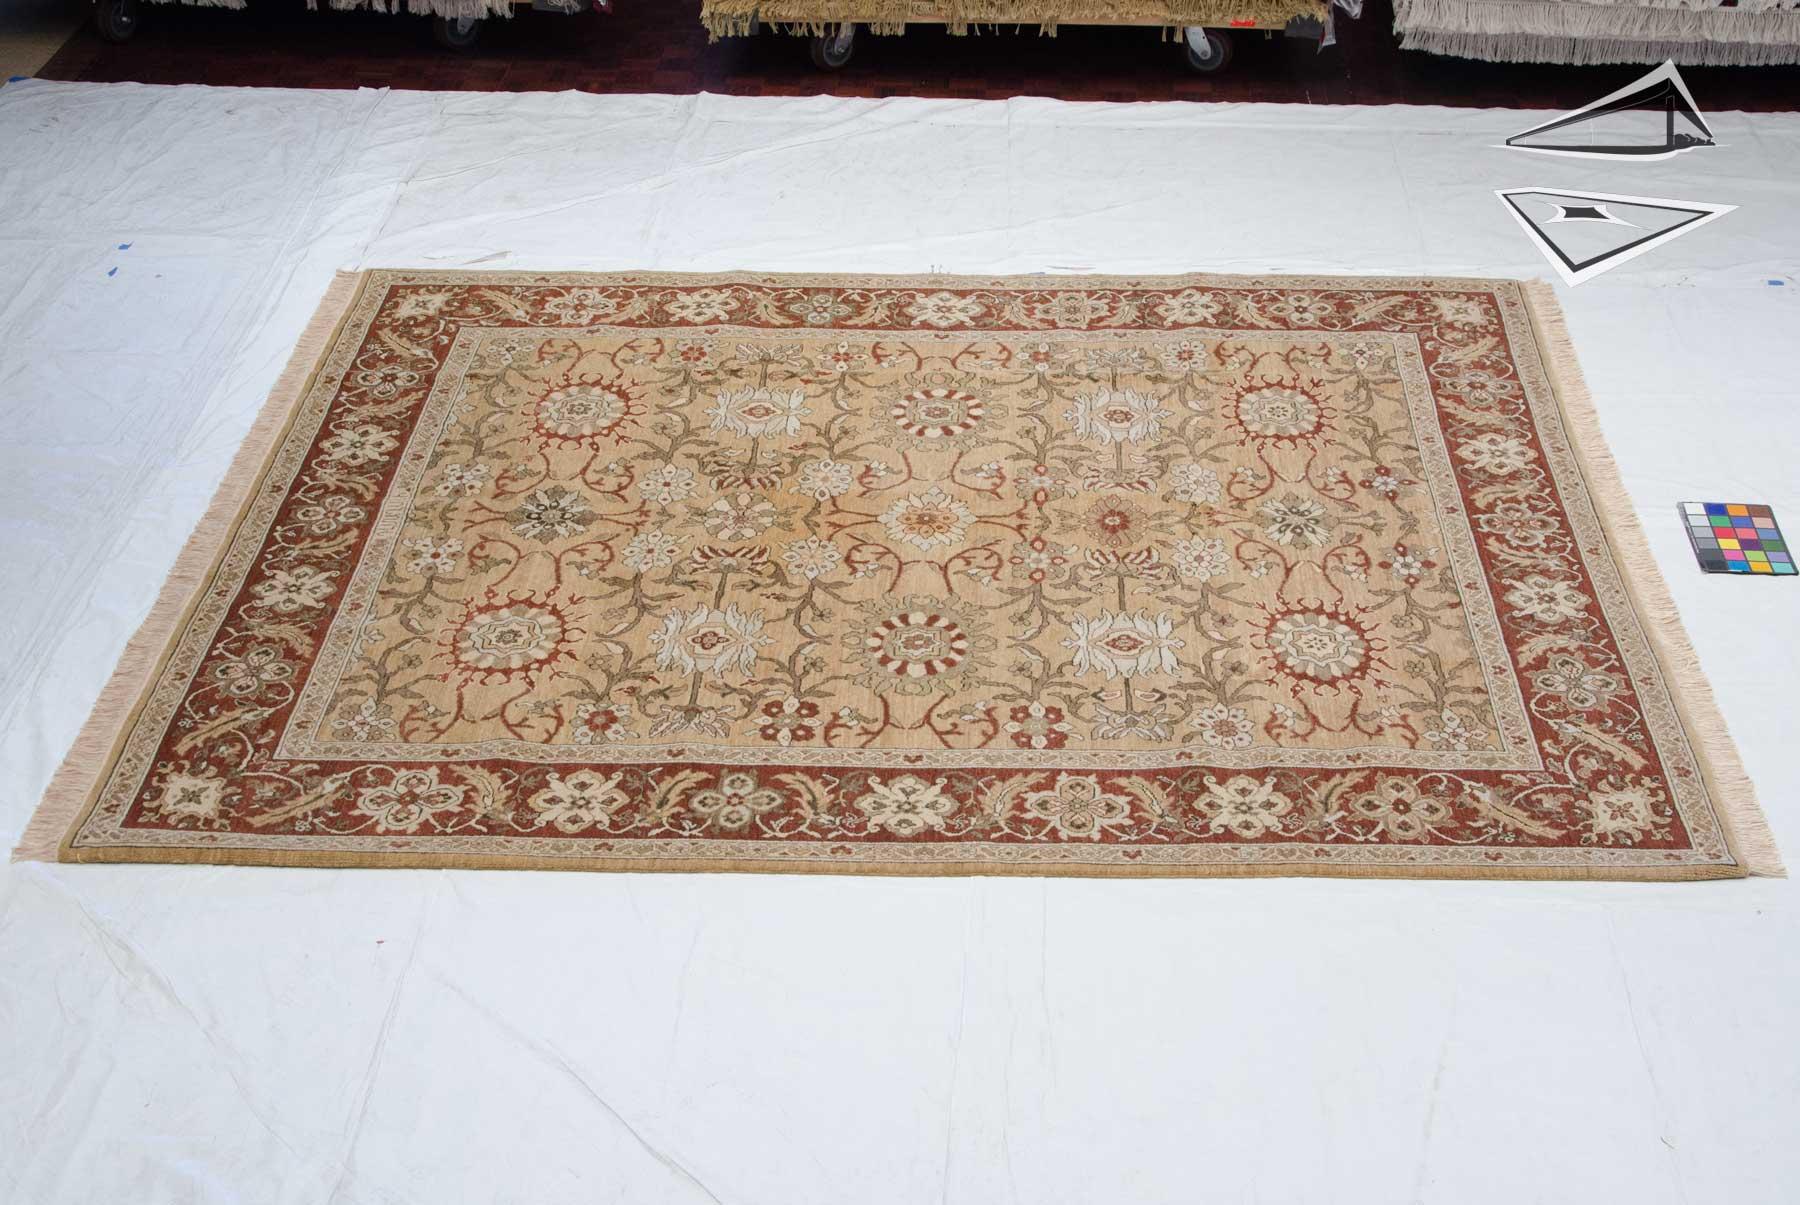 Sultanabad Design Rug 8' x 10'